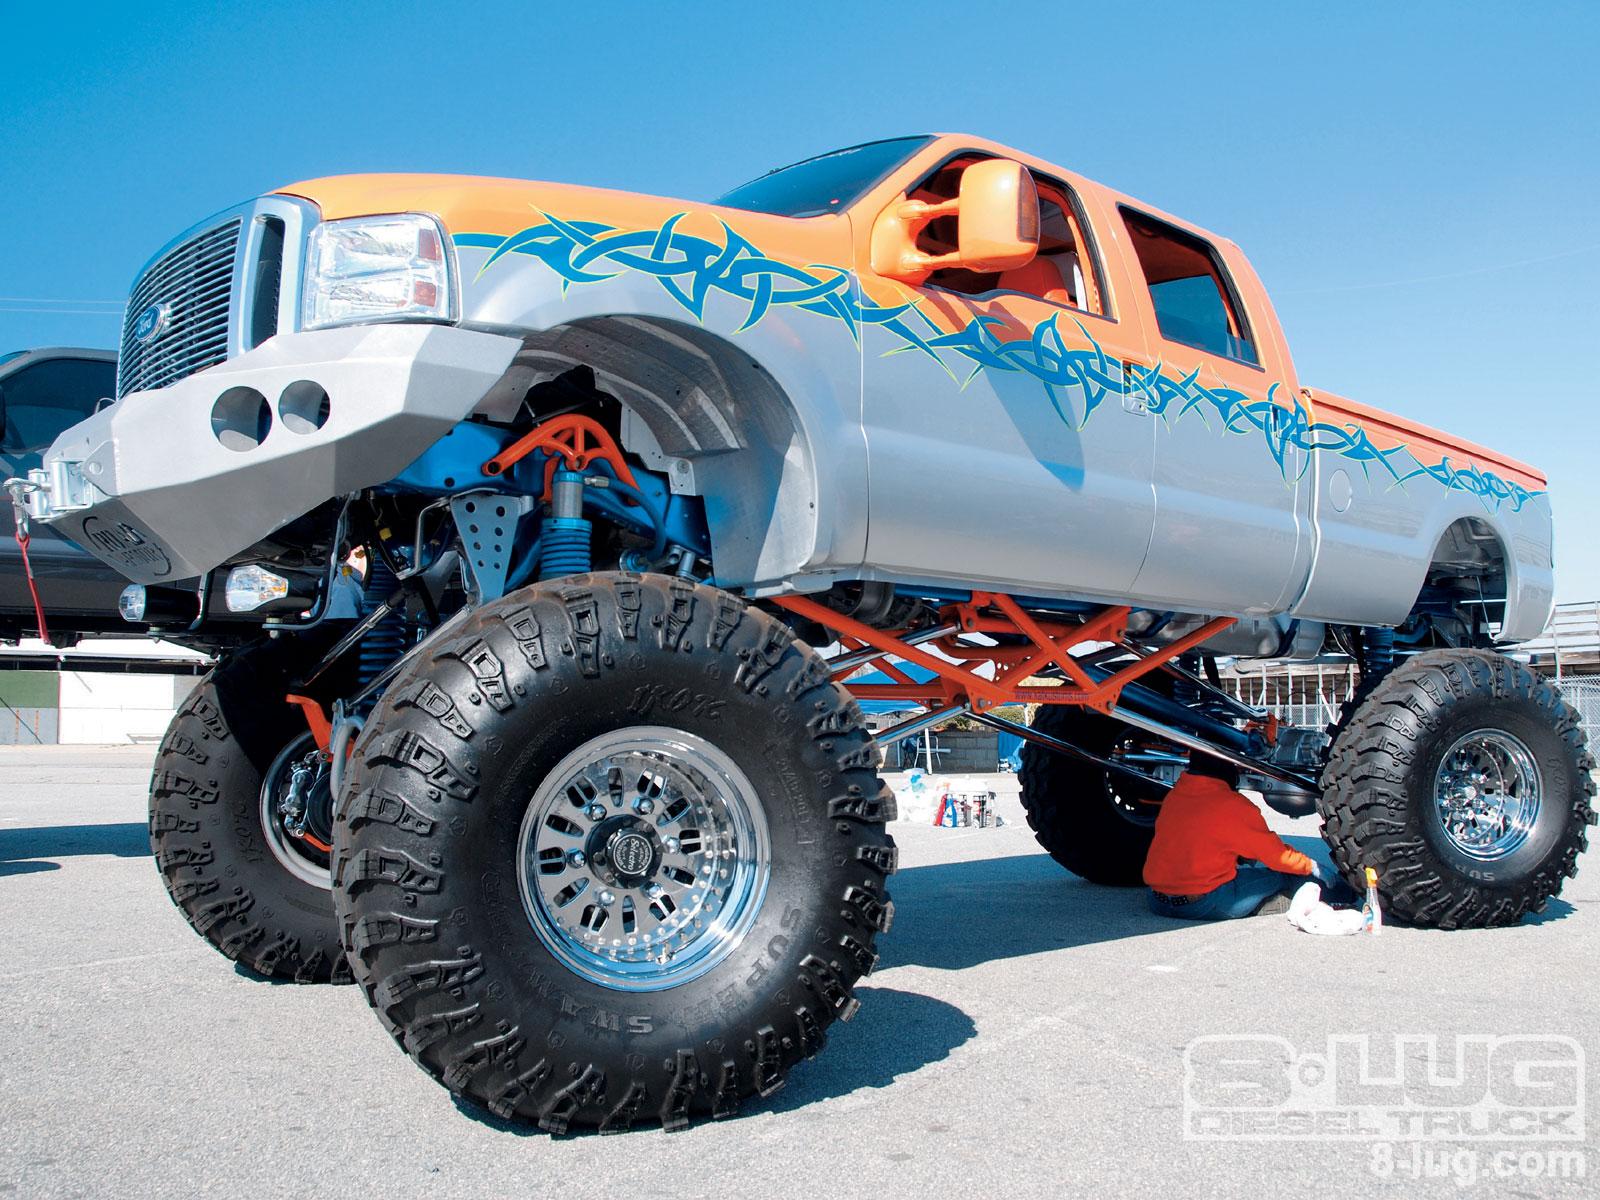 Ford Truck Limo Limo Monster Truck Monster